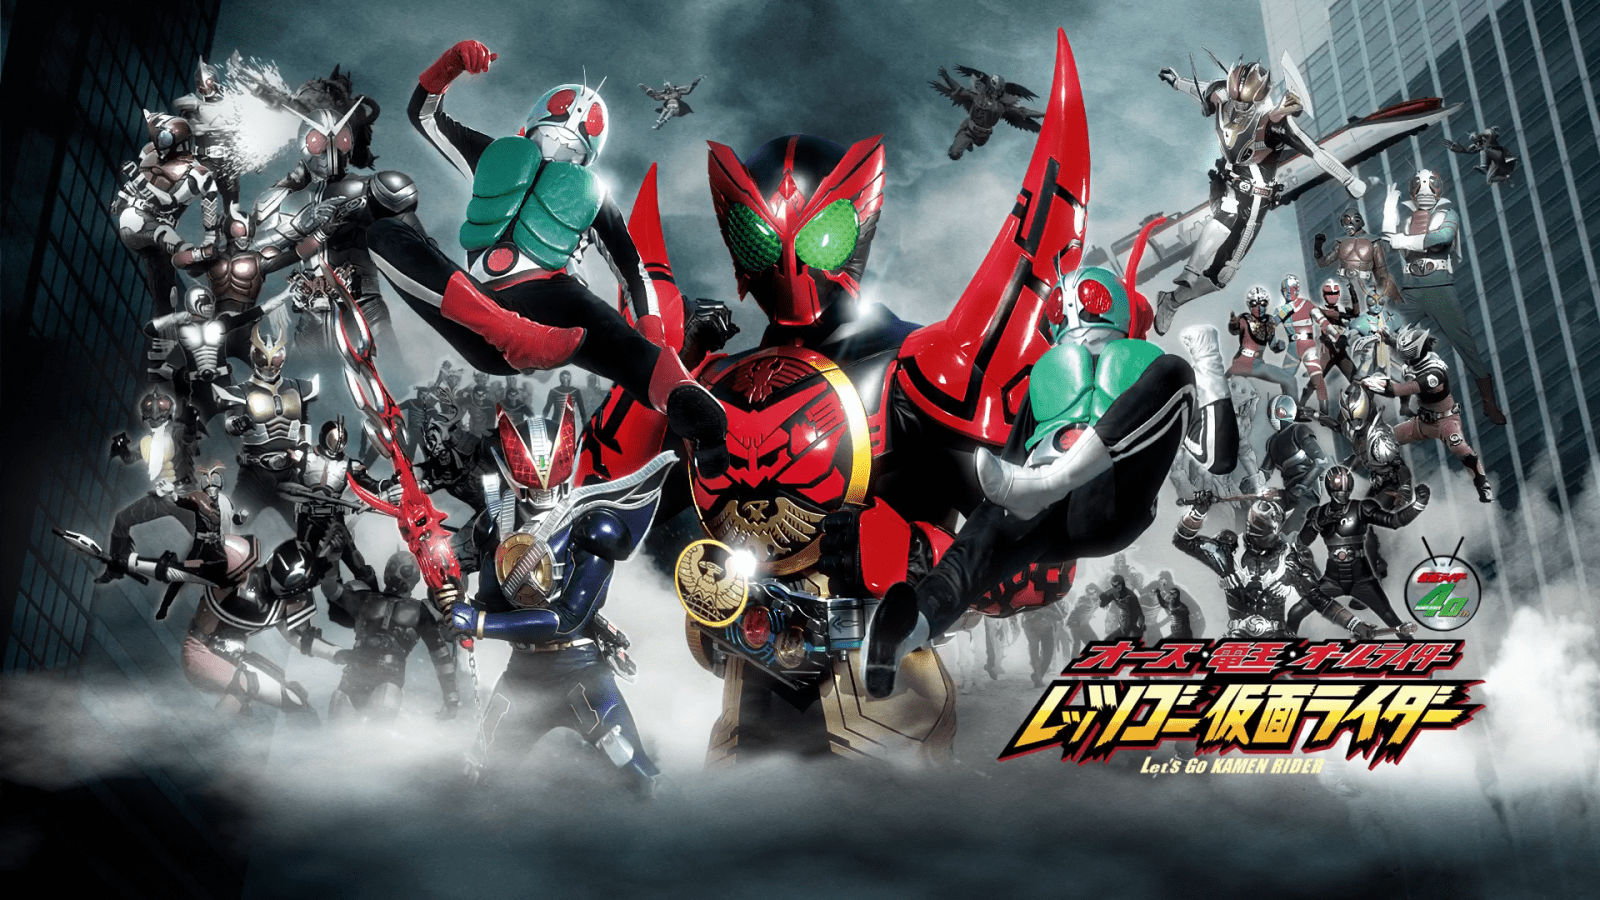 2011 Ooo Den O All Riders Lets Go Kamen Riders 1 (1)